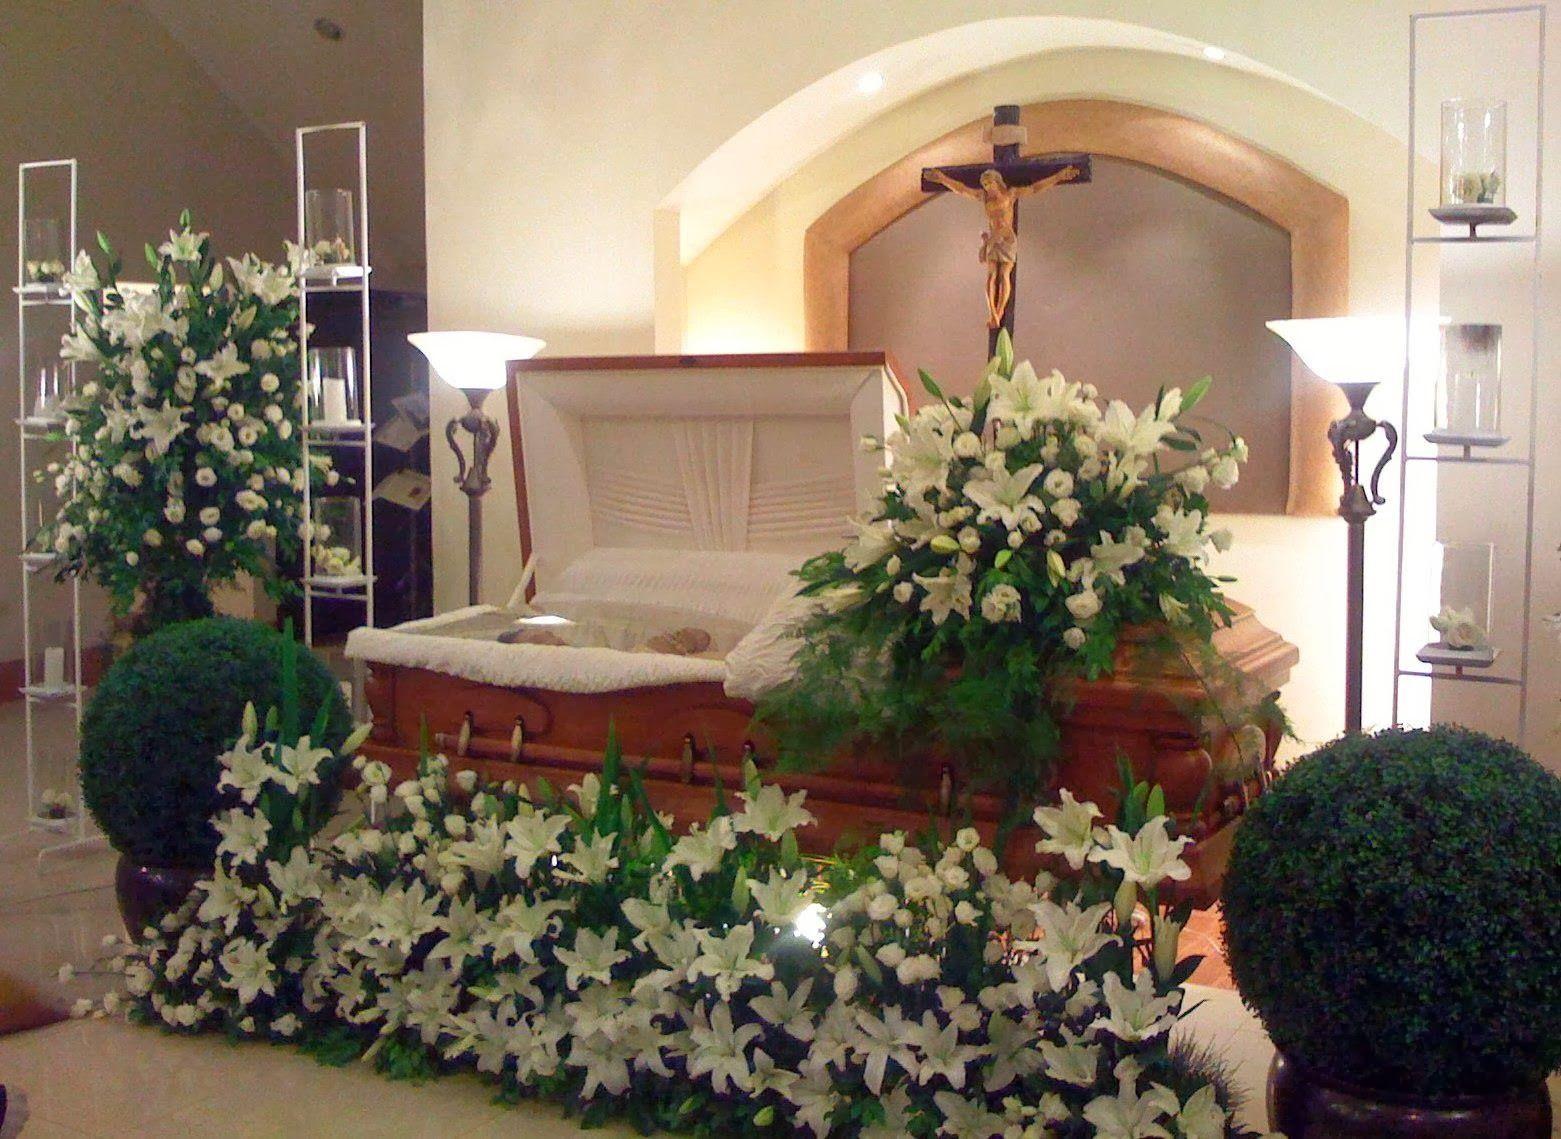 Nice White Floral Arrangements Around The Casket Funeral Flowers Casket Flowers Funeral Flower Arrangements